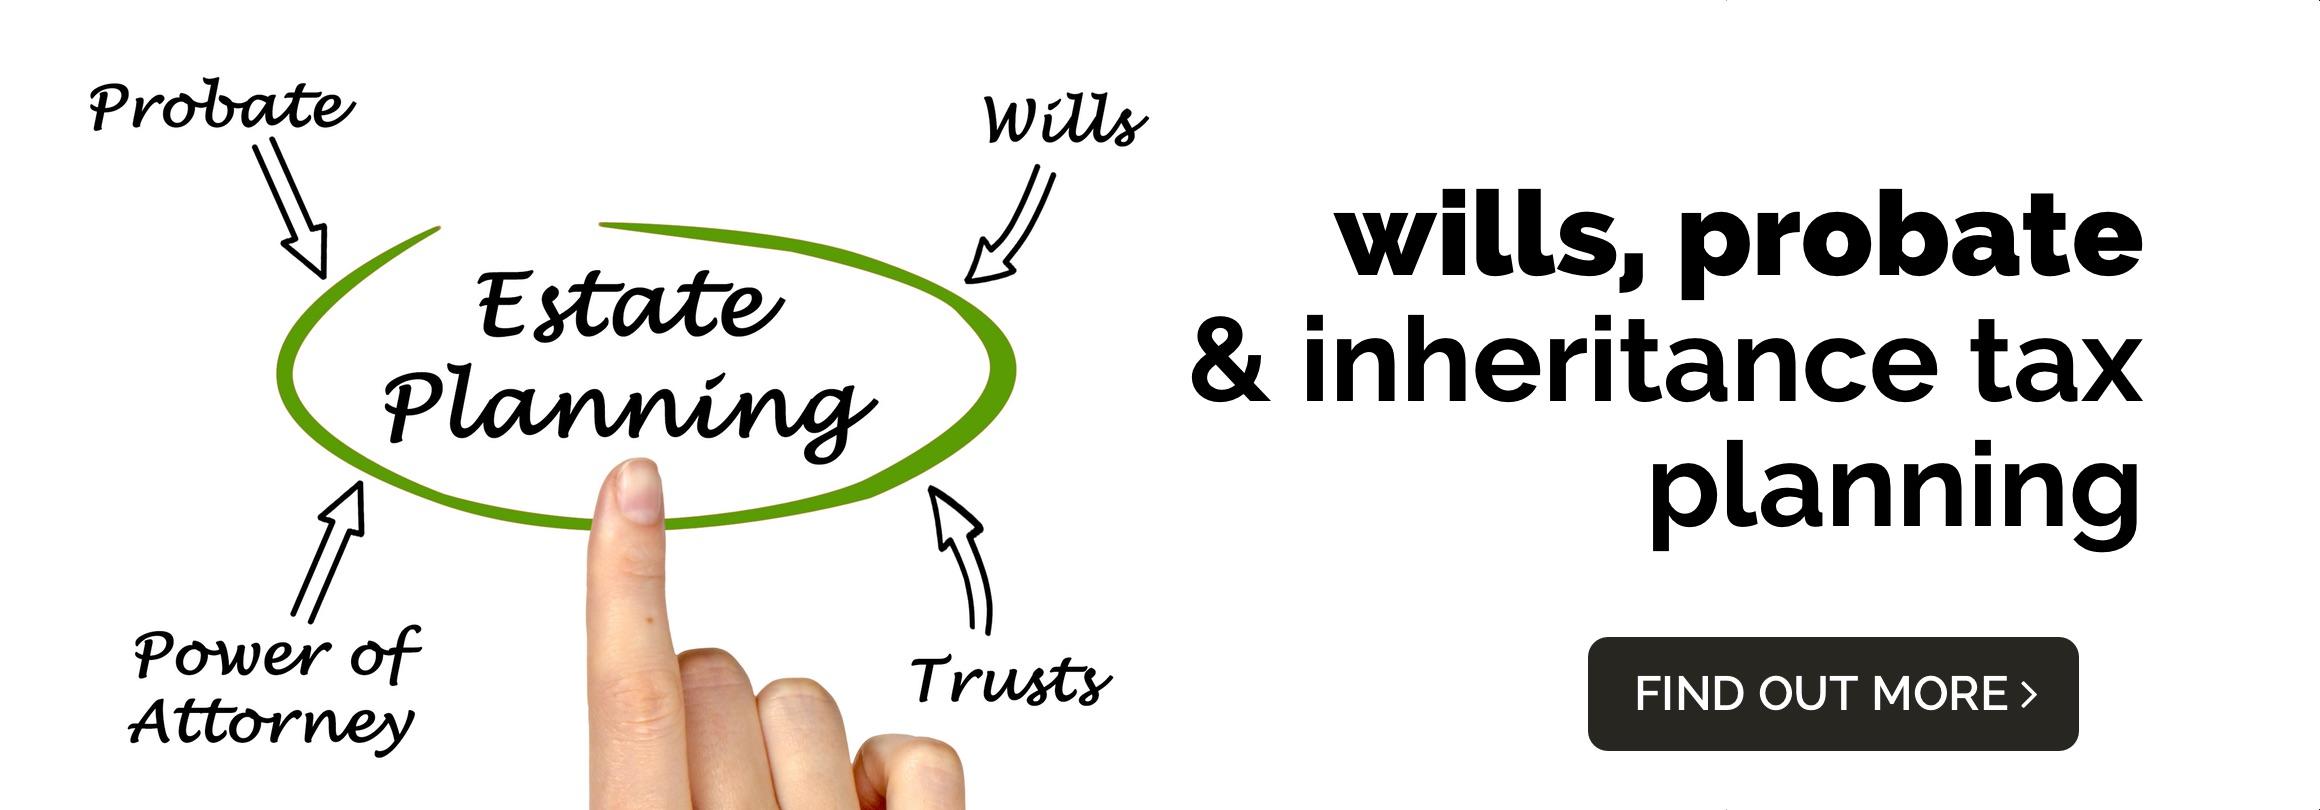 Wills, Probate and Inheritance Tax Planning